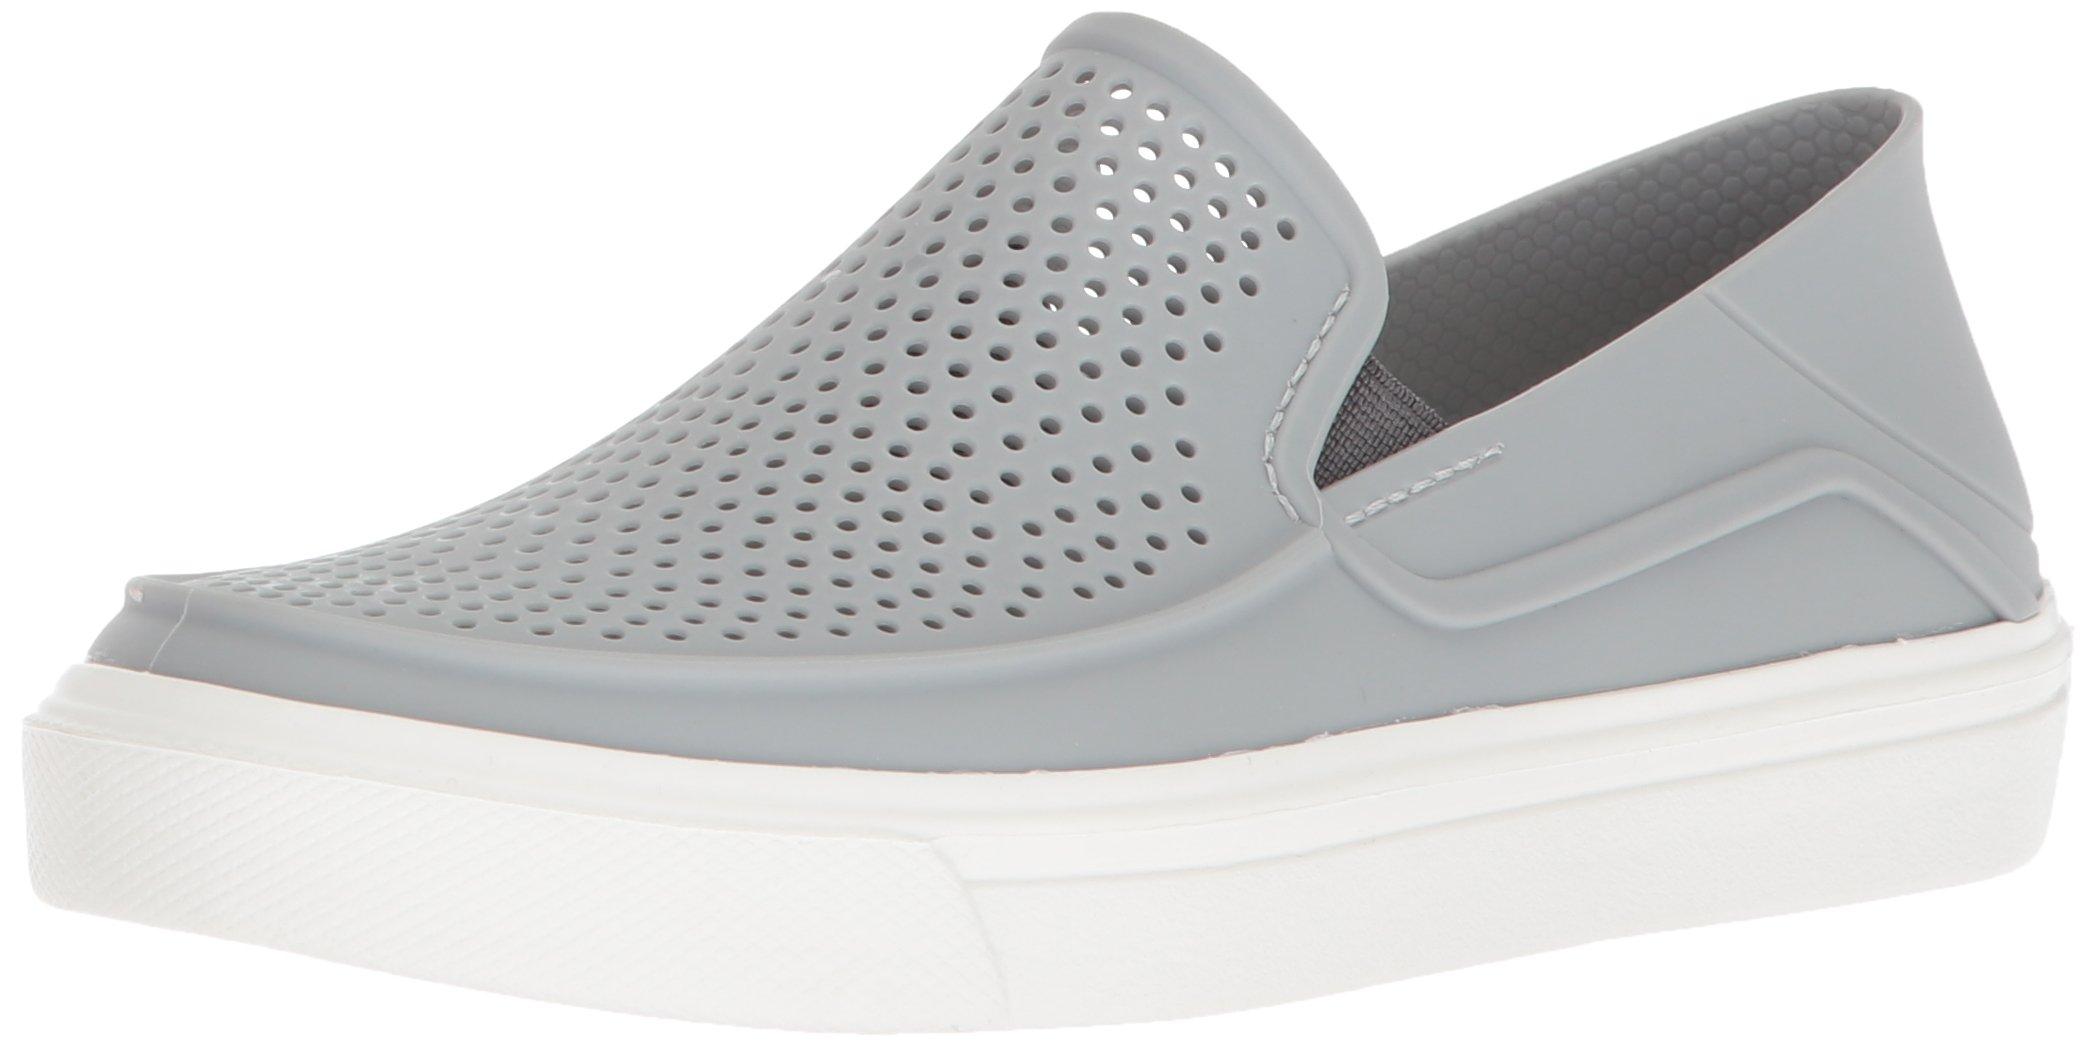 Crocs Kids' Citilane Roka Slip-On, Light Grey/White, 8 M US Toddler